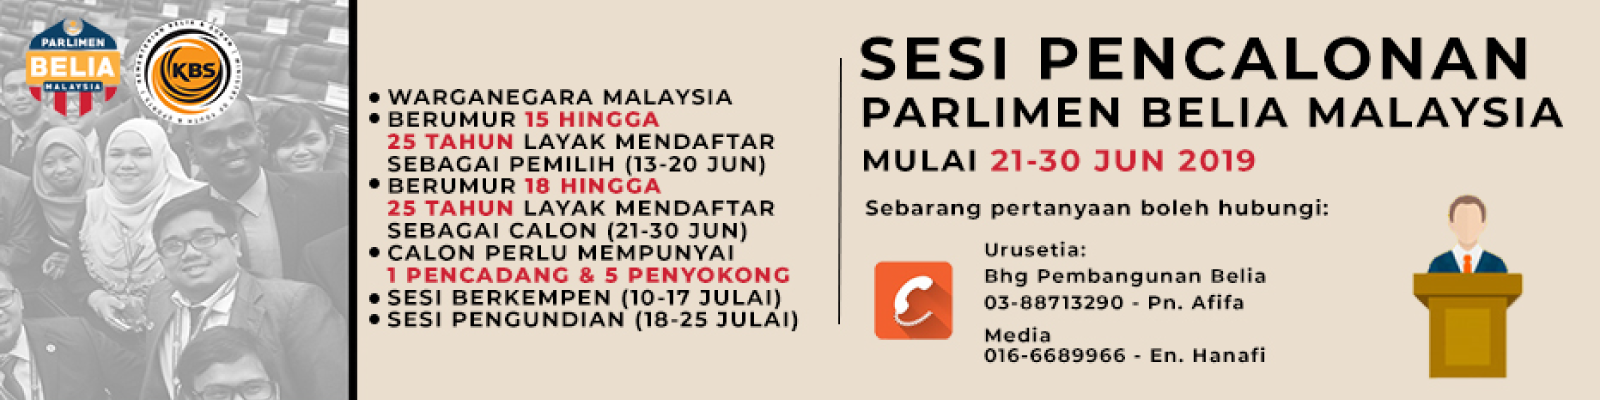 parlimen25062019.png